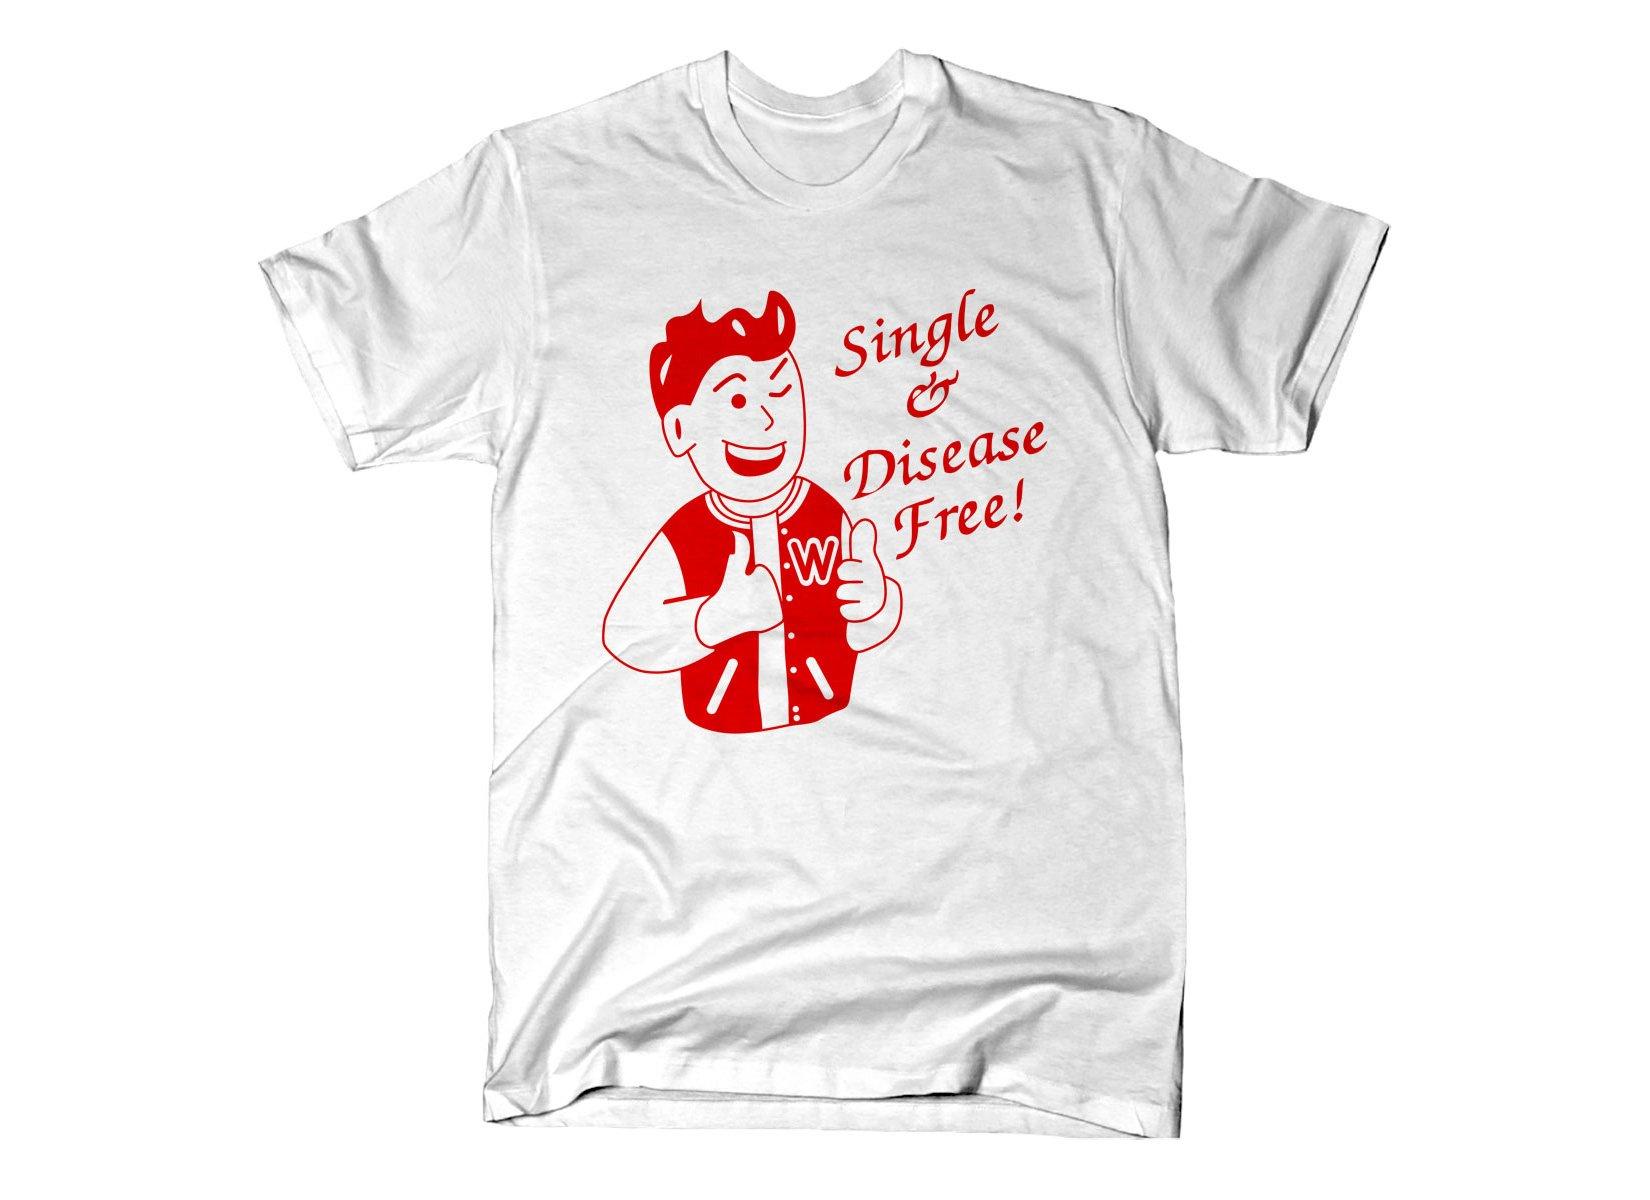 Single & Disease Free on Mens T-Shirt